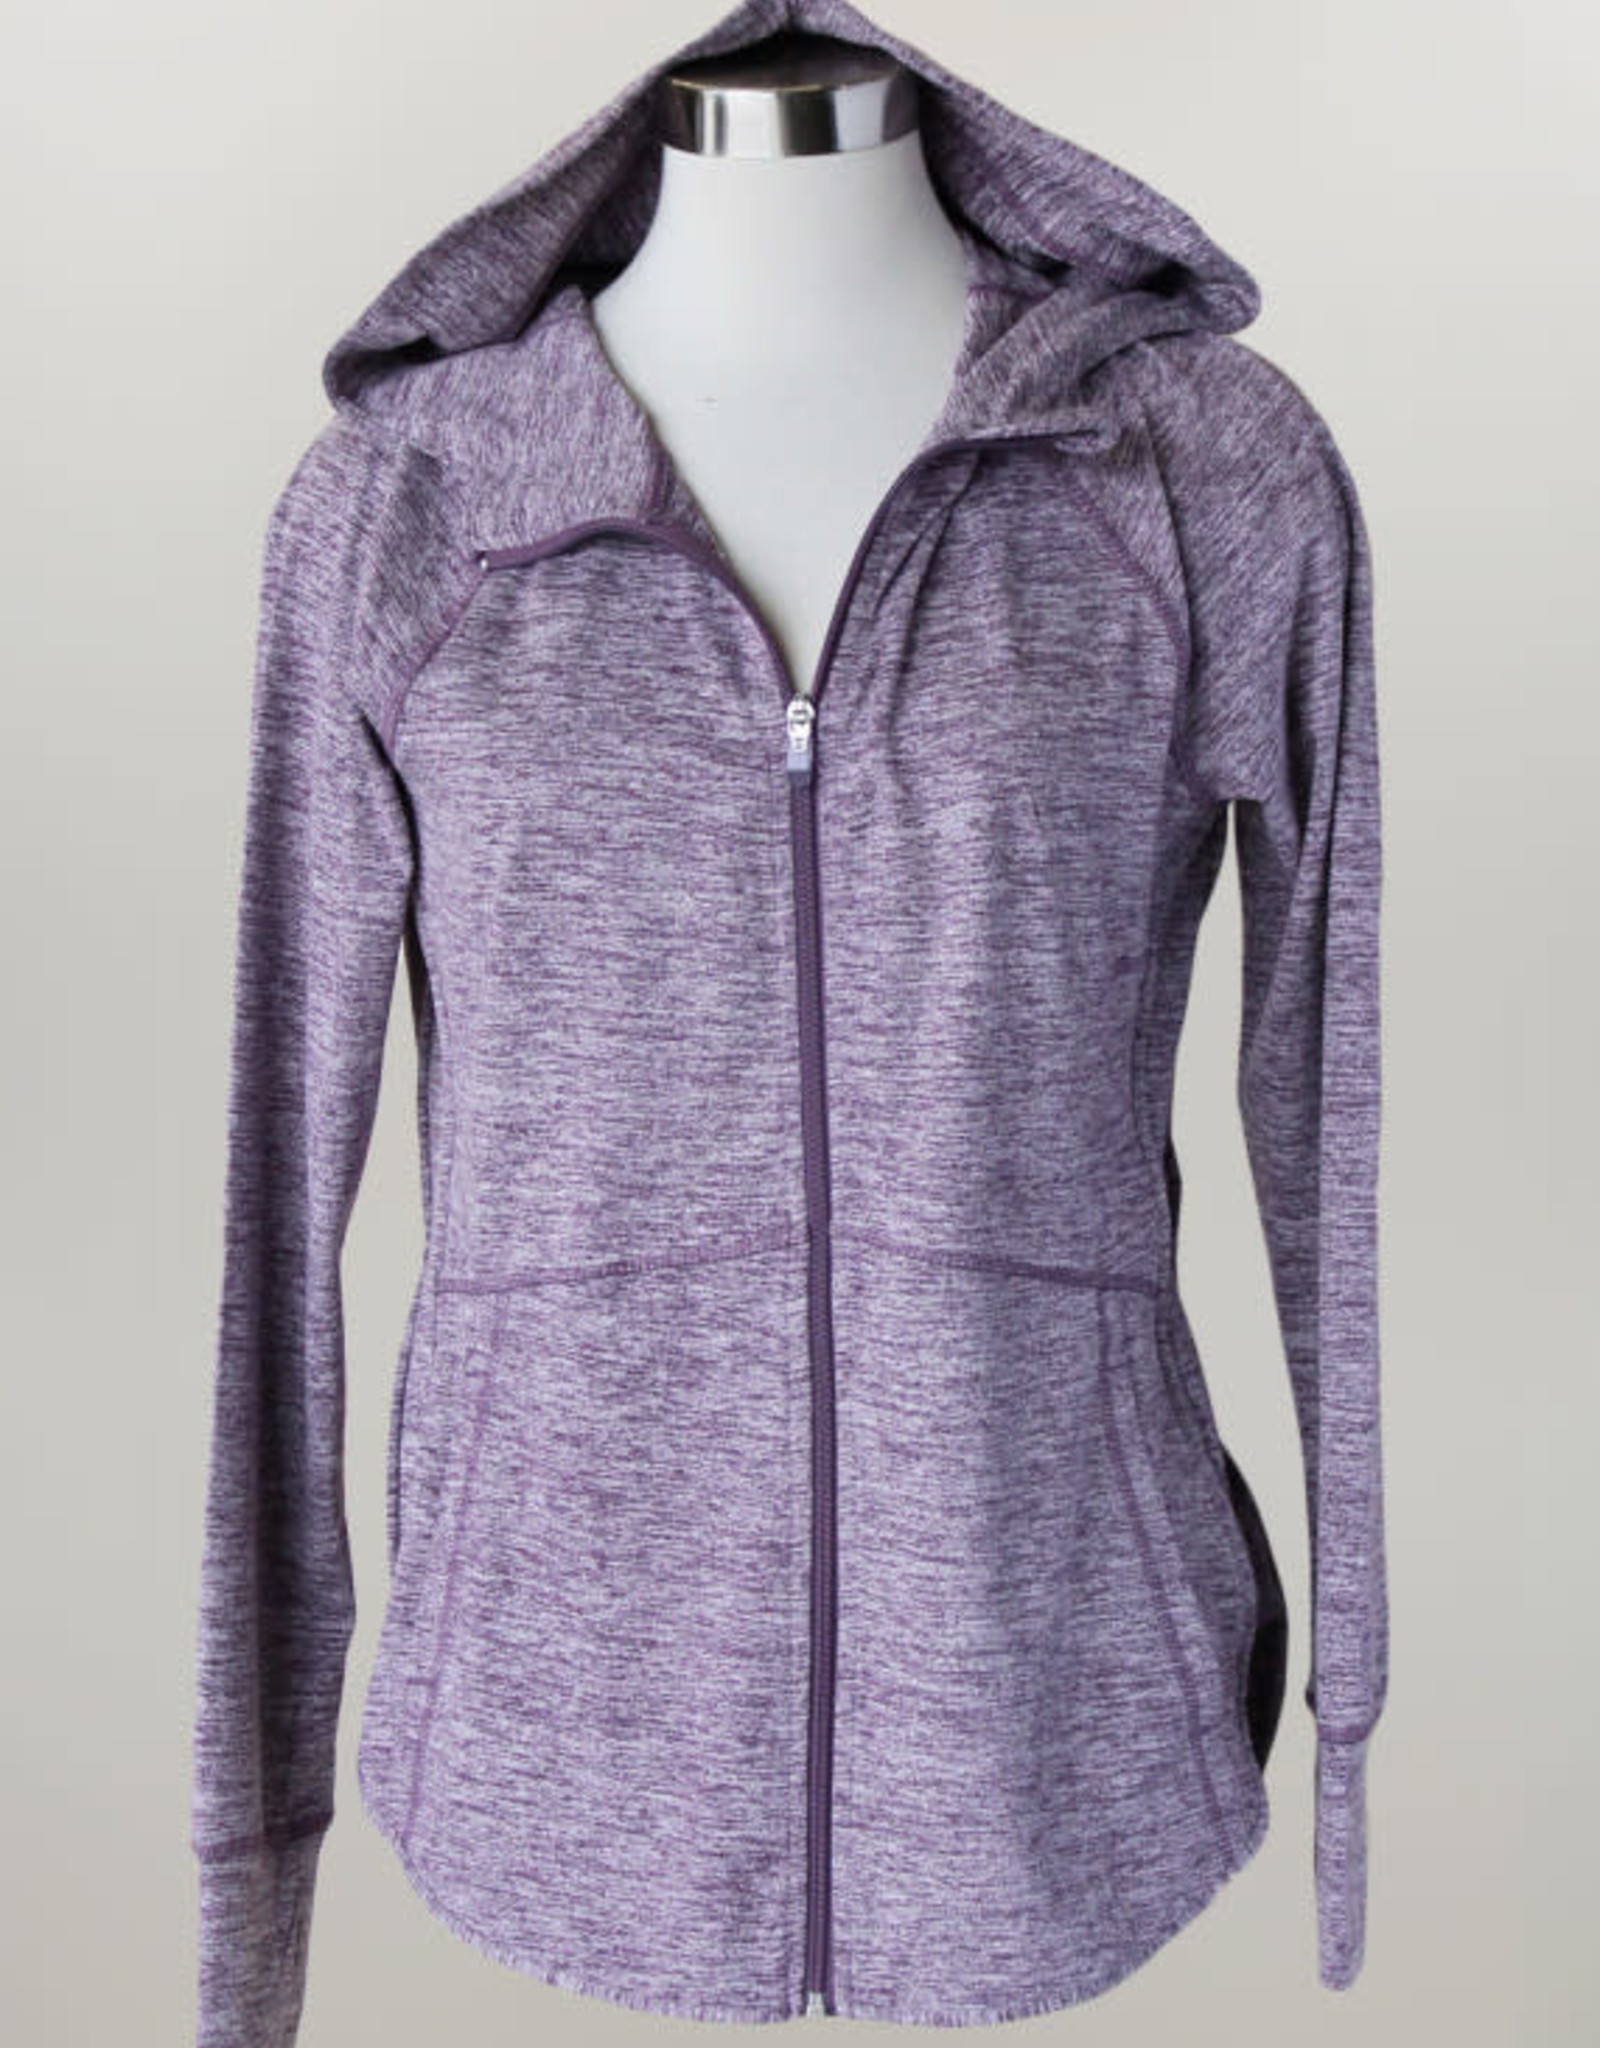 - Heather Purple Zip-Up Athletic Jacket